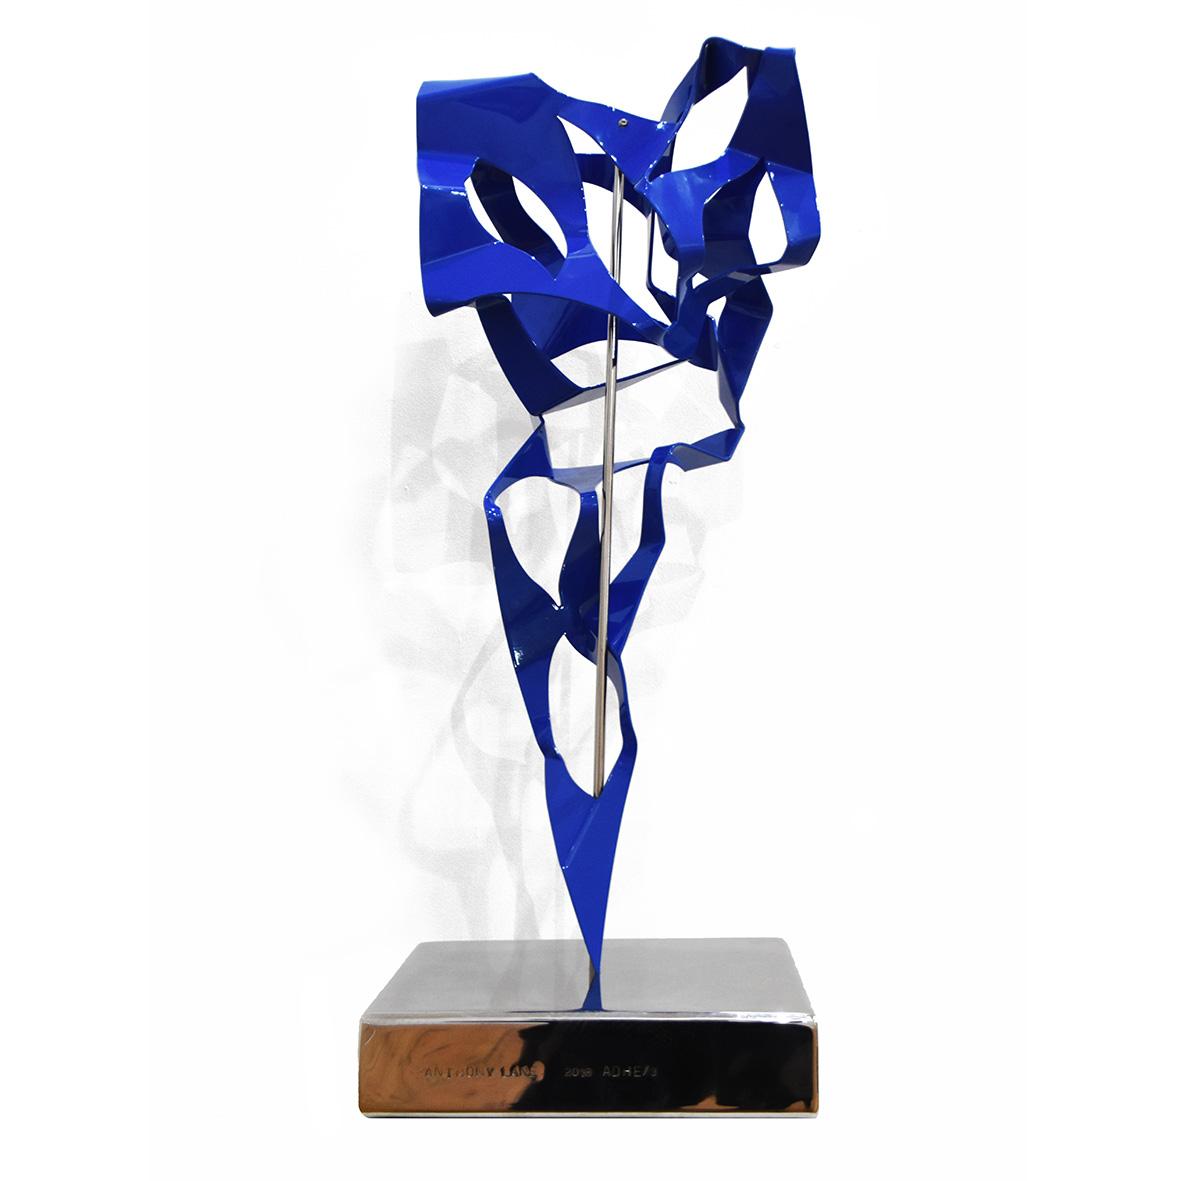 Anthony Lane, 2018, Mixed Media sculpture ( ADHE 3 ), 30 x 30 x 86 cm